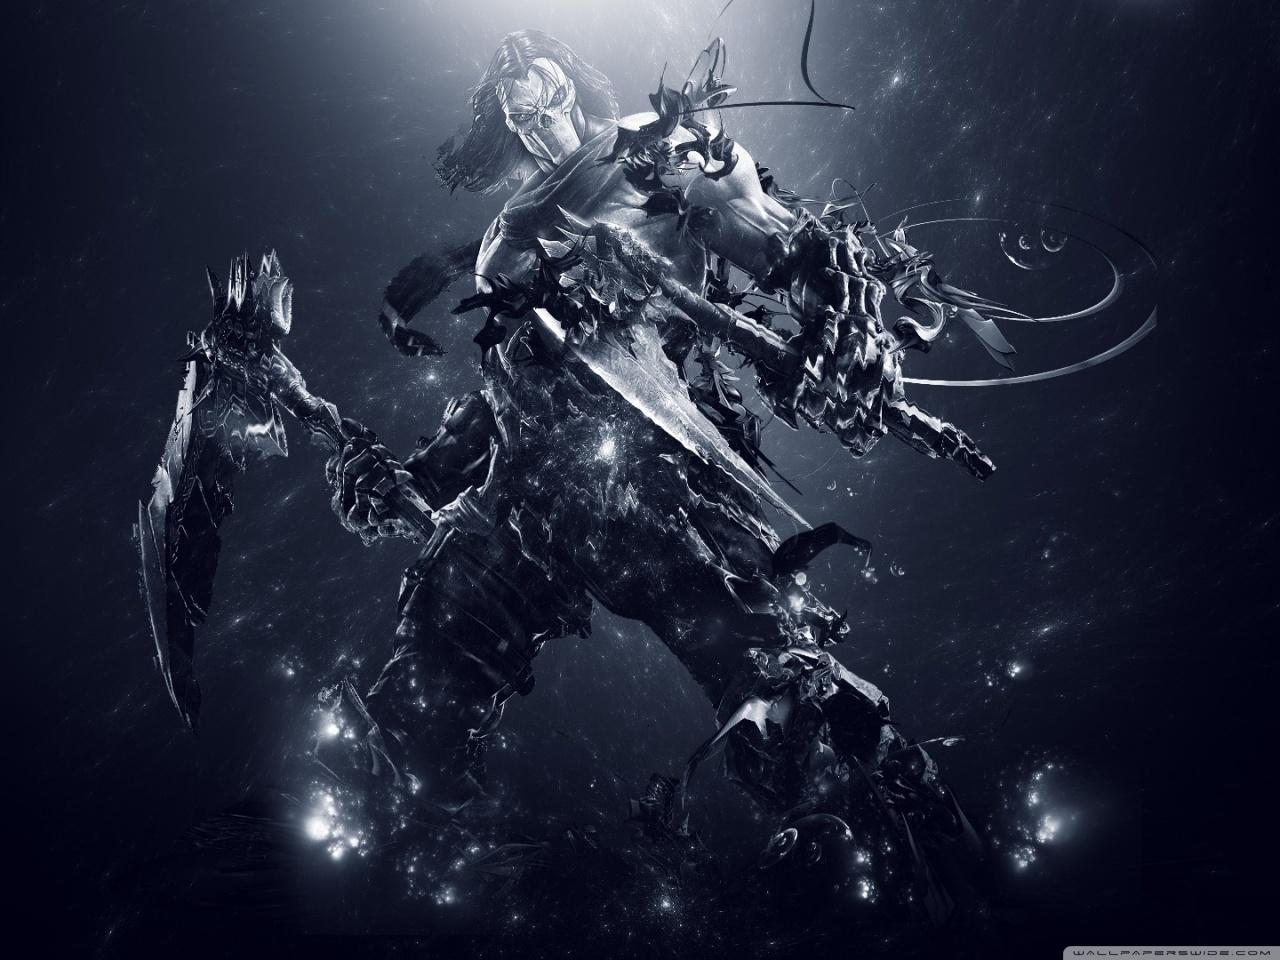 Darksiders 2 wallpaper 1280x960 fondo de pantalla 2654 - Descargar darksiders 2 ...